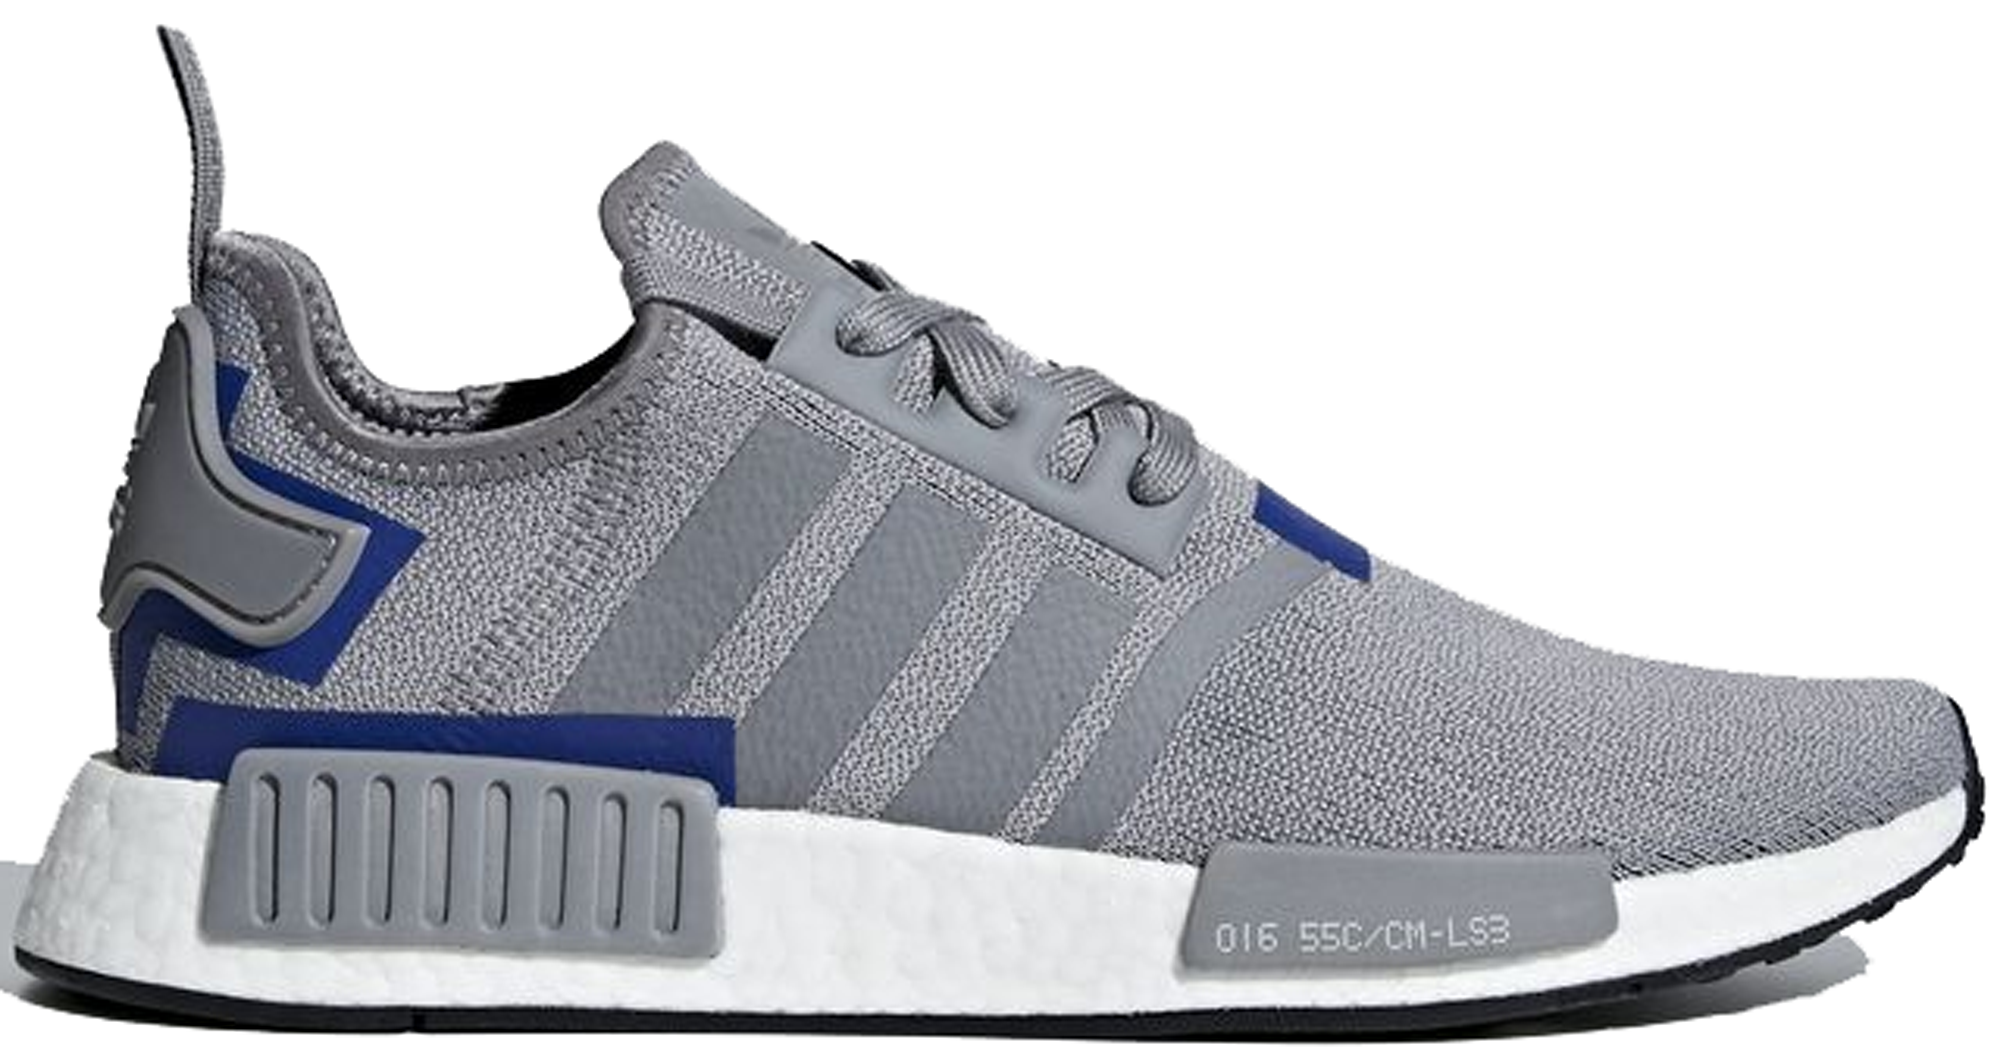 adidas NMD R1 Colorblock Grey Blue - BD7742